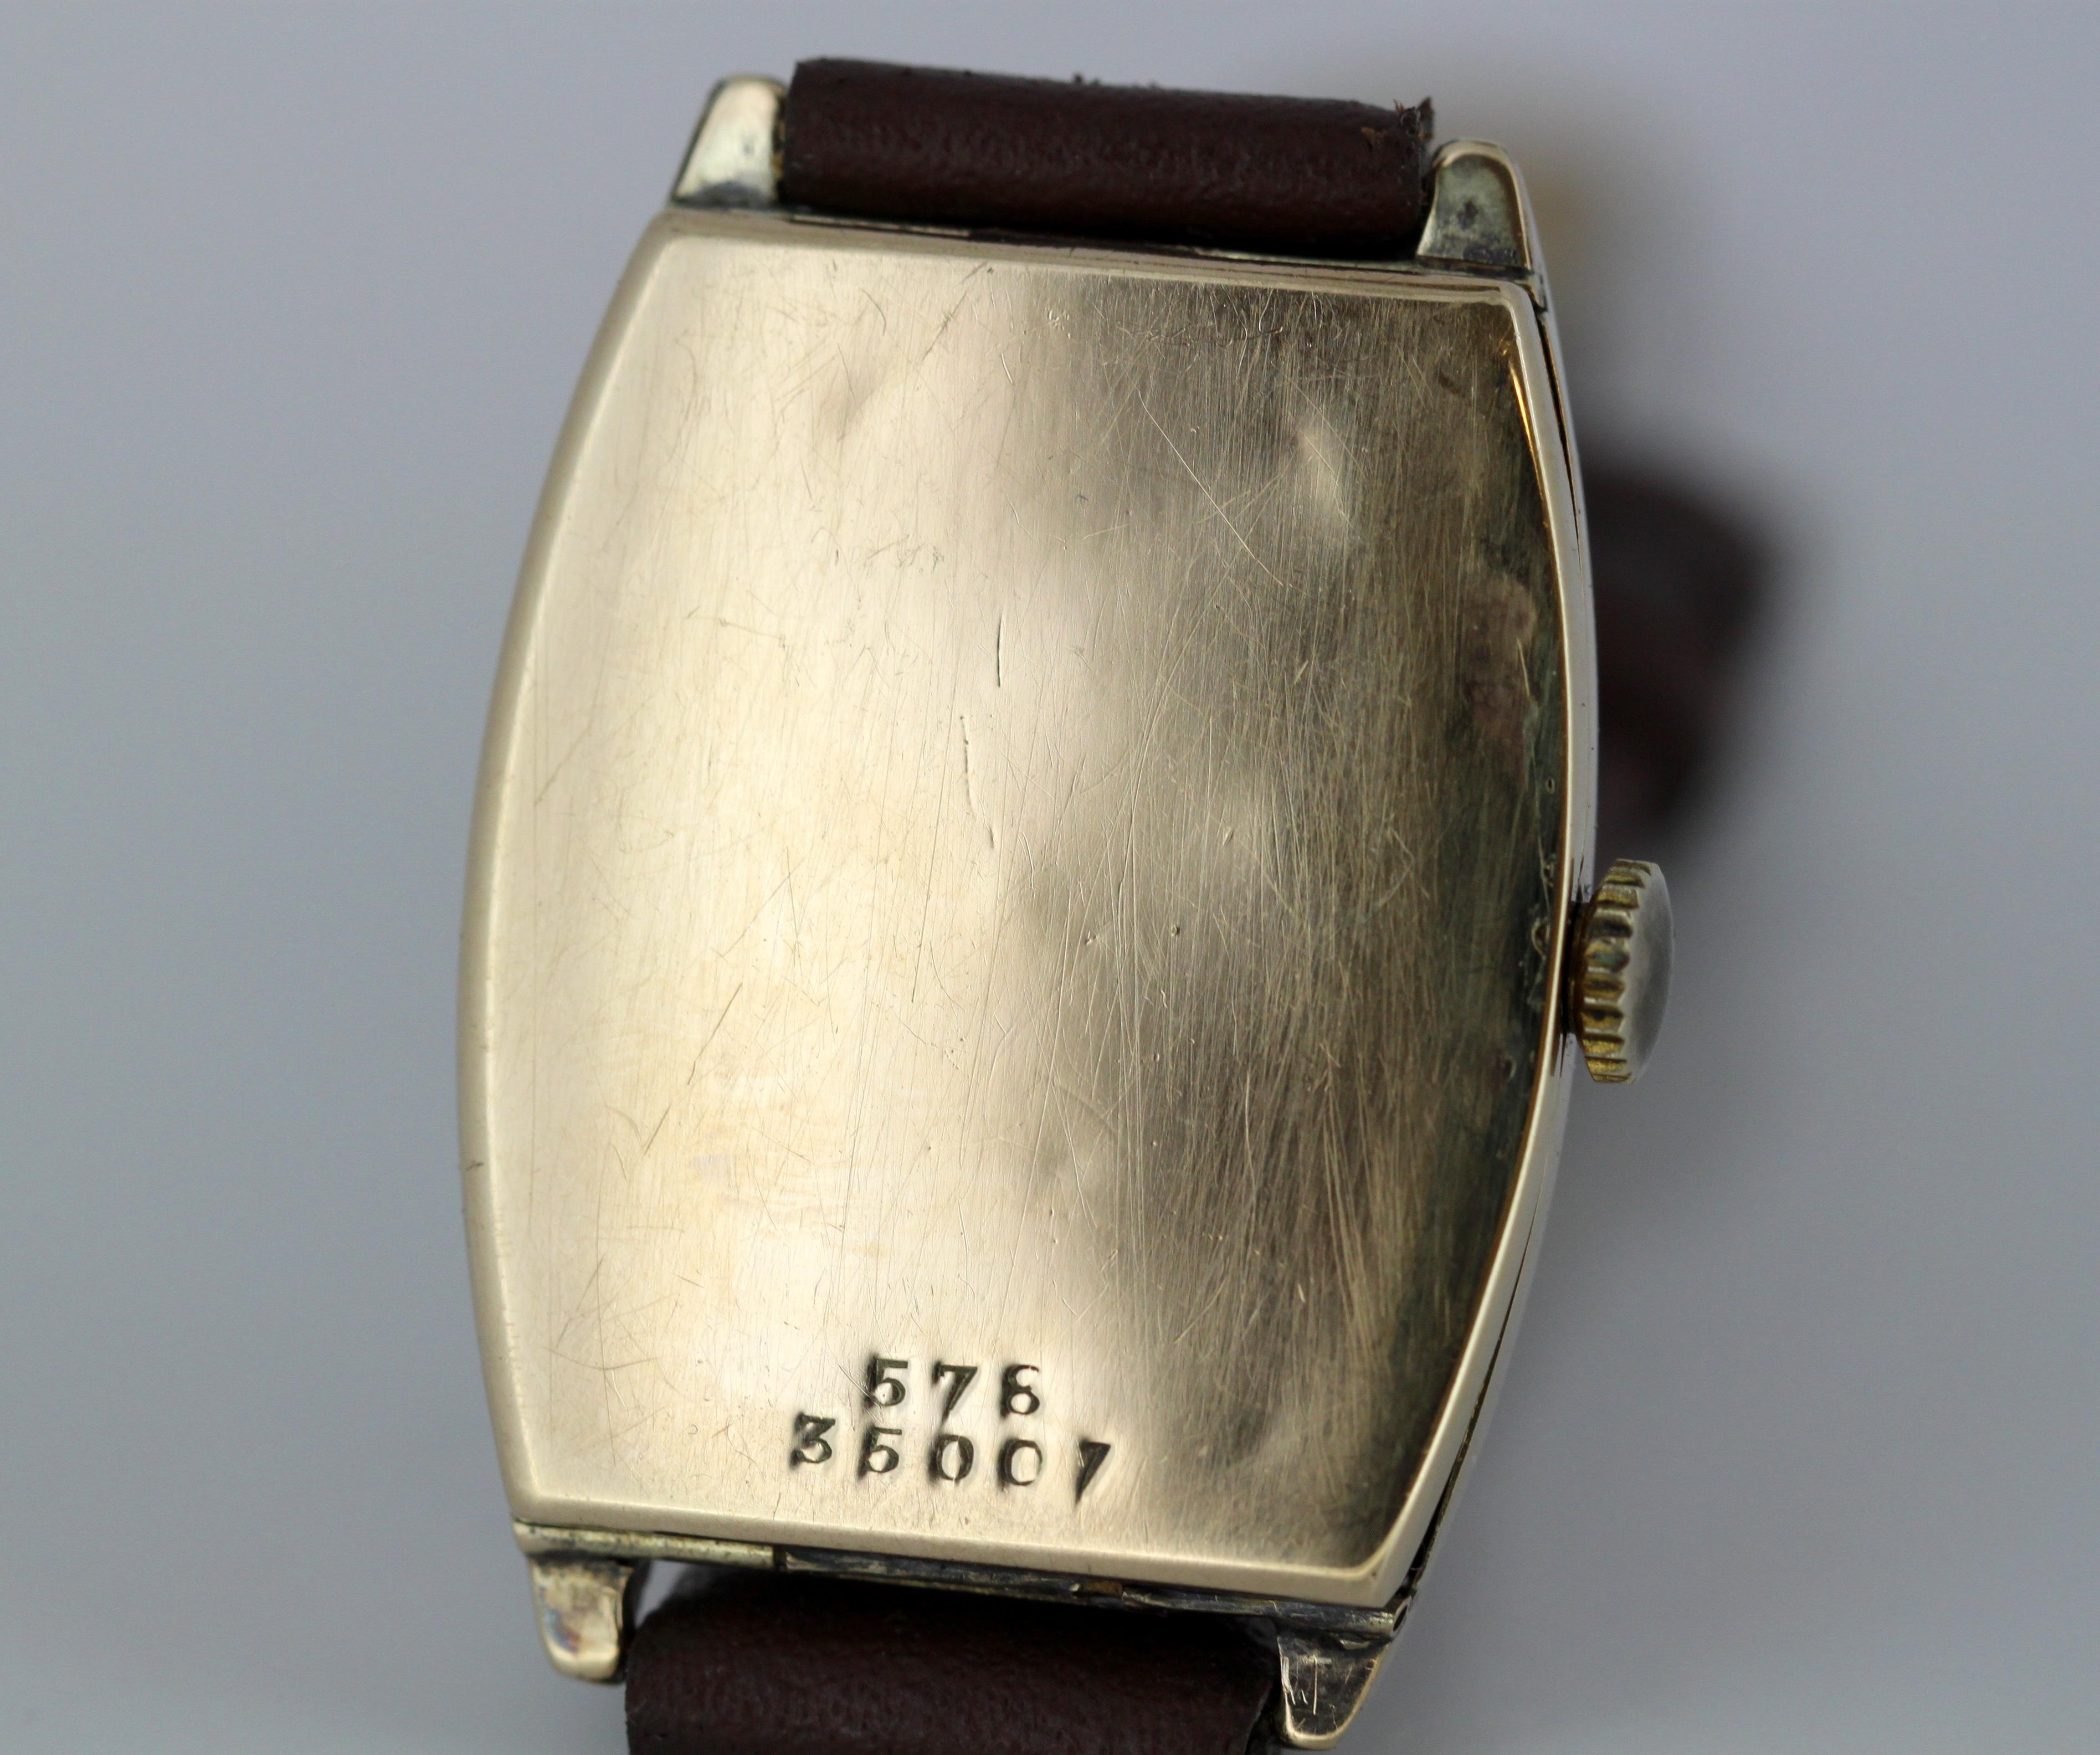 Antique Rolex, Manual Winding Wristwatch, circa 1920s